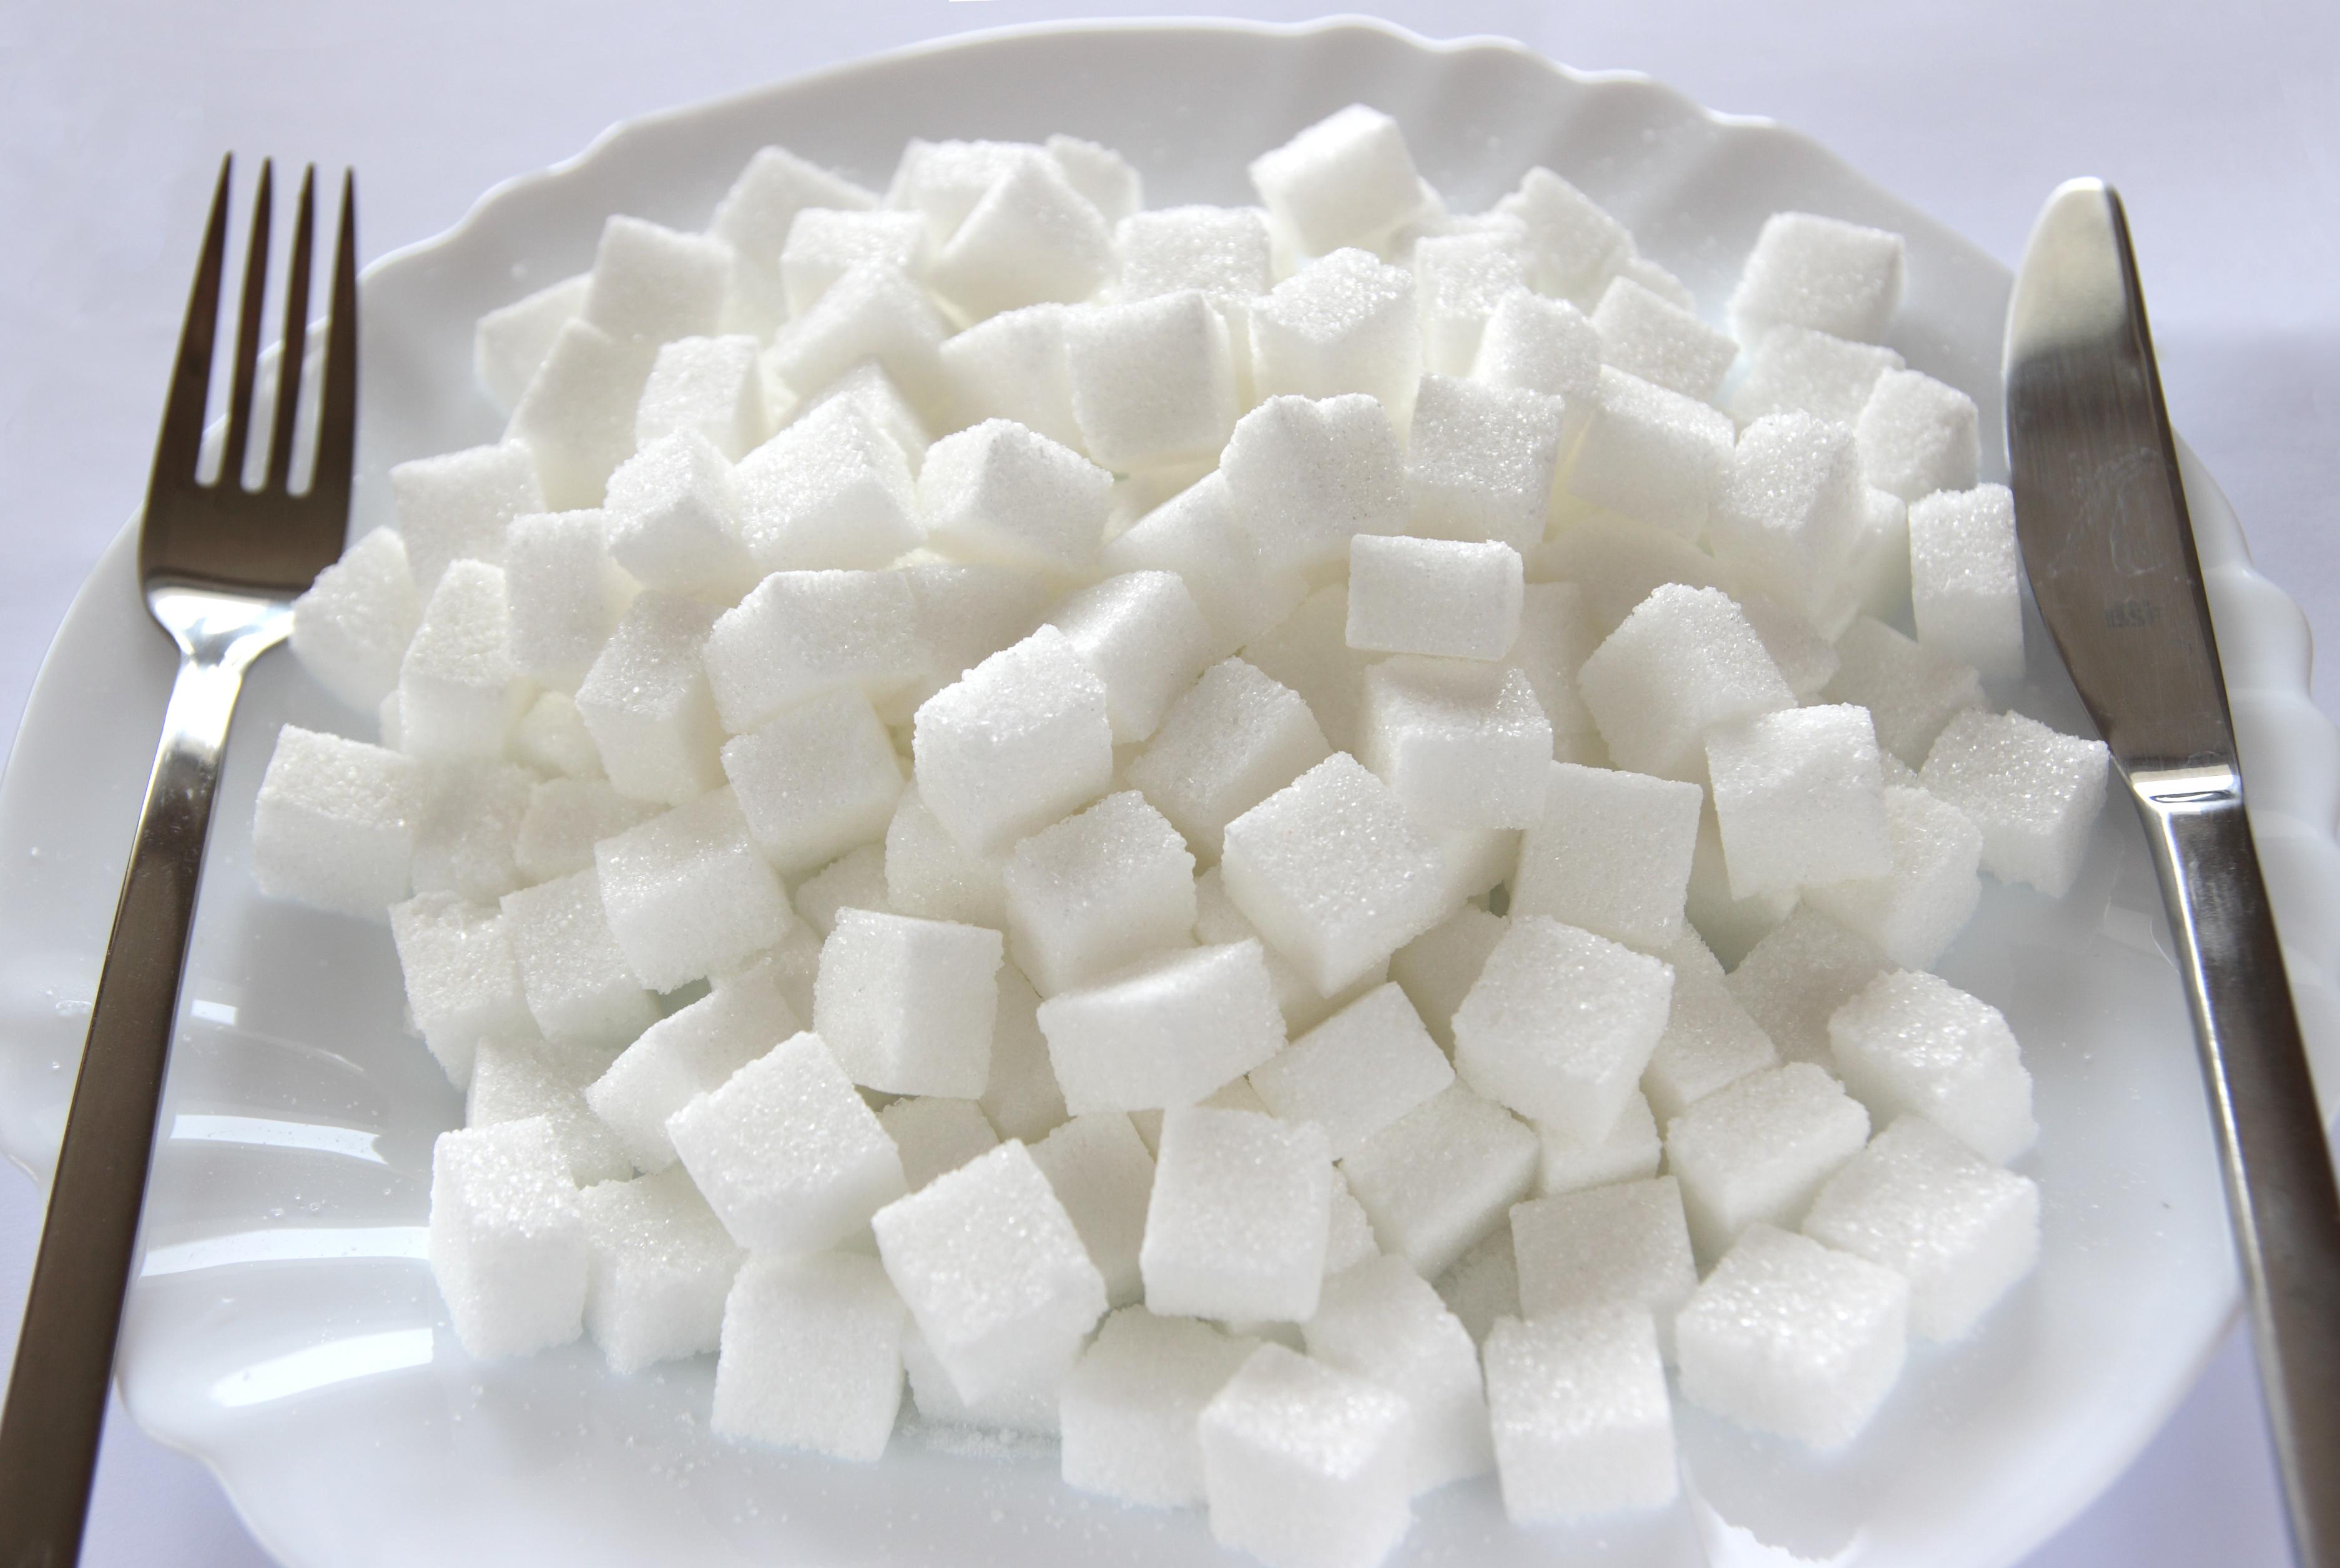 2-es típusú cukorbetegség magas vérnyomású étele